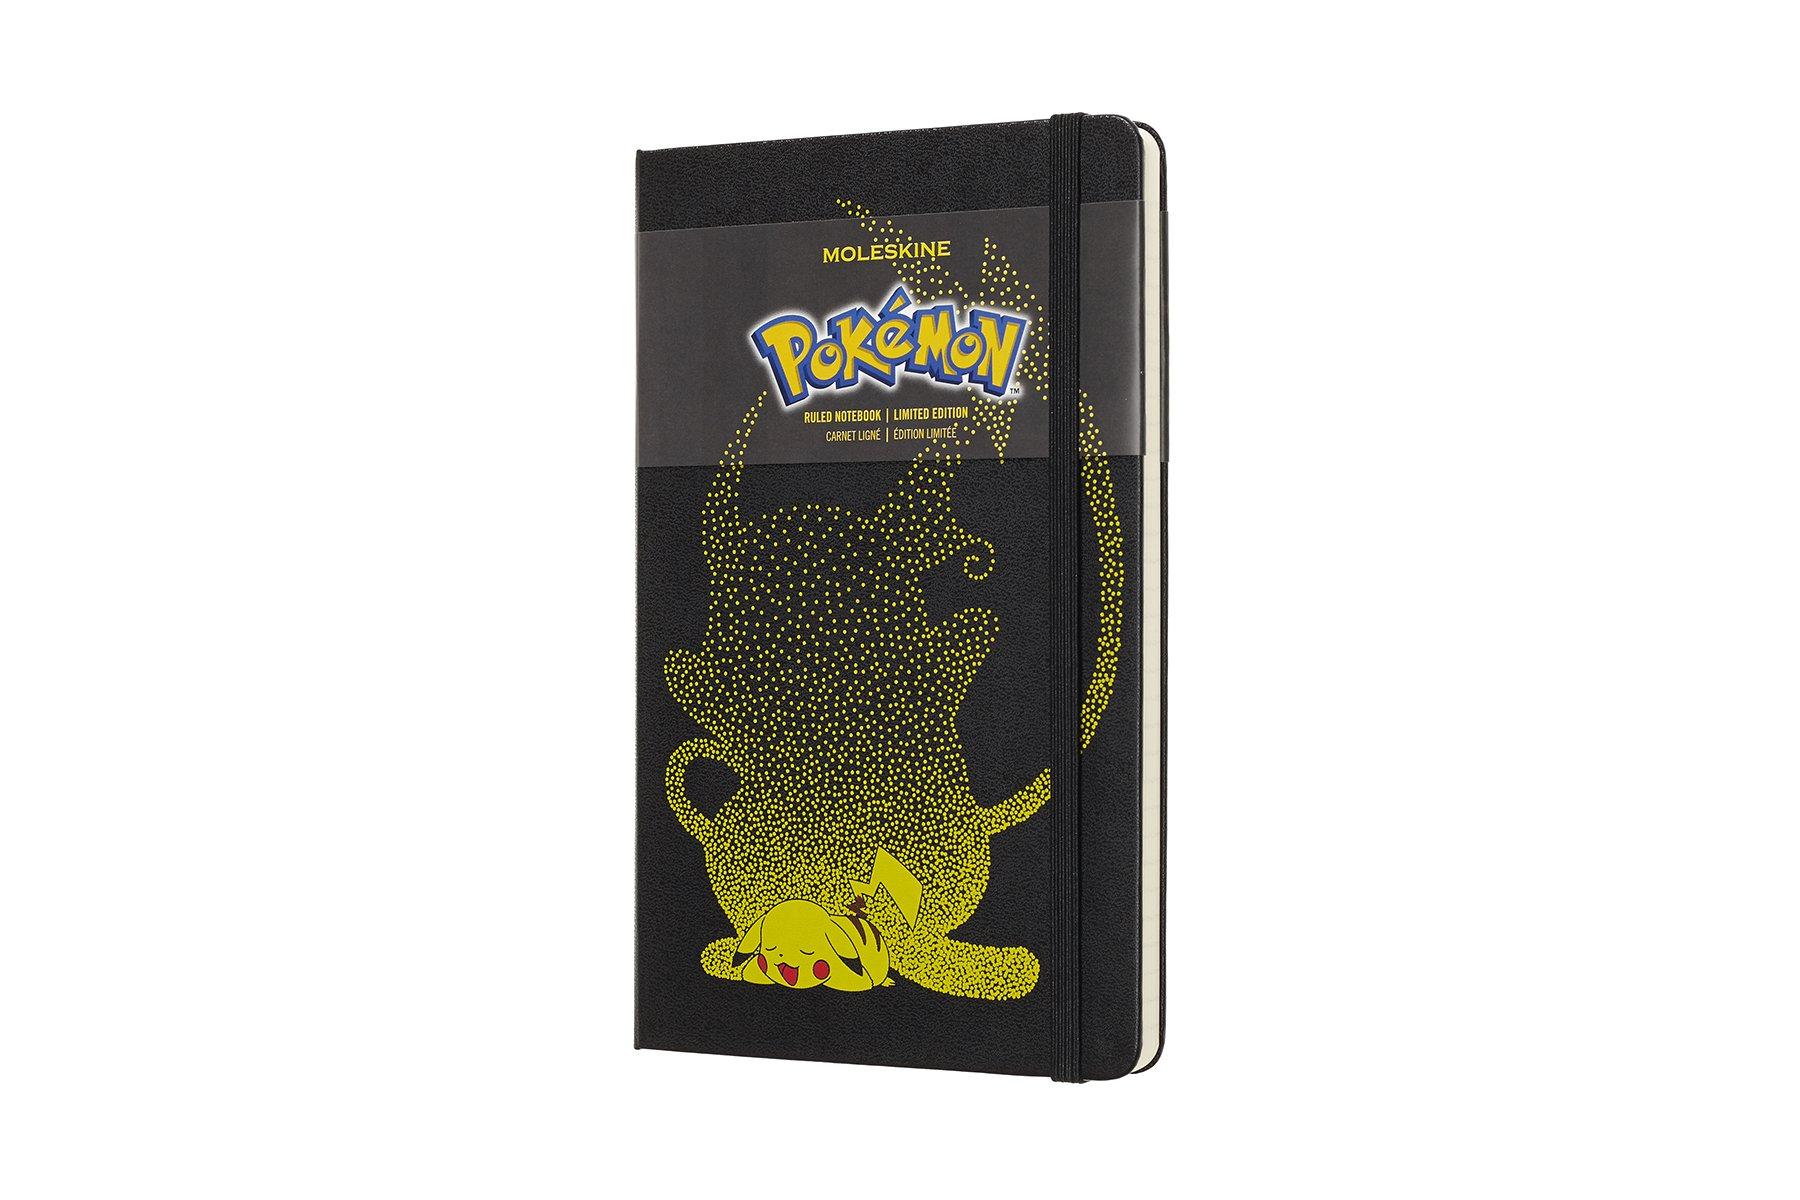 Moleskine Limited Edition Pokémon Hard Cover Notebook,...